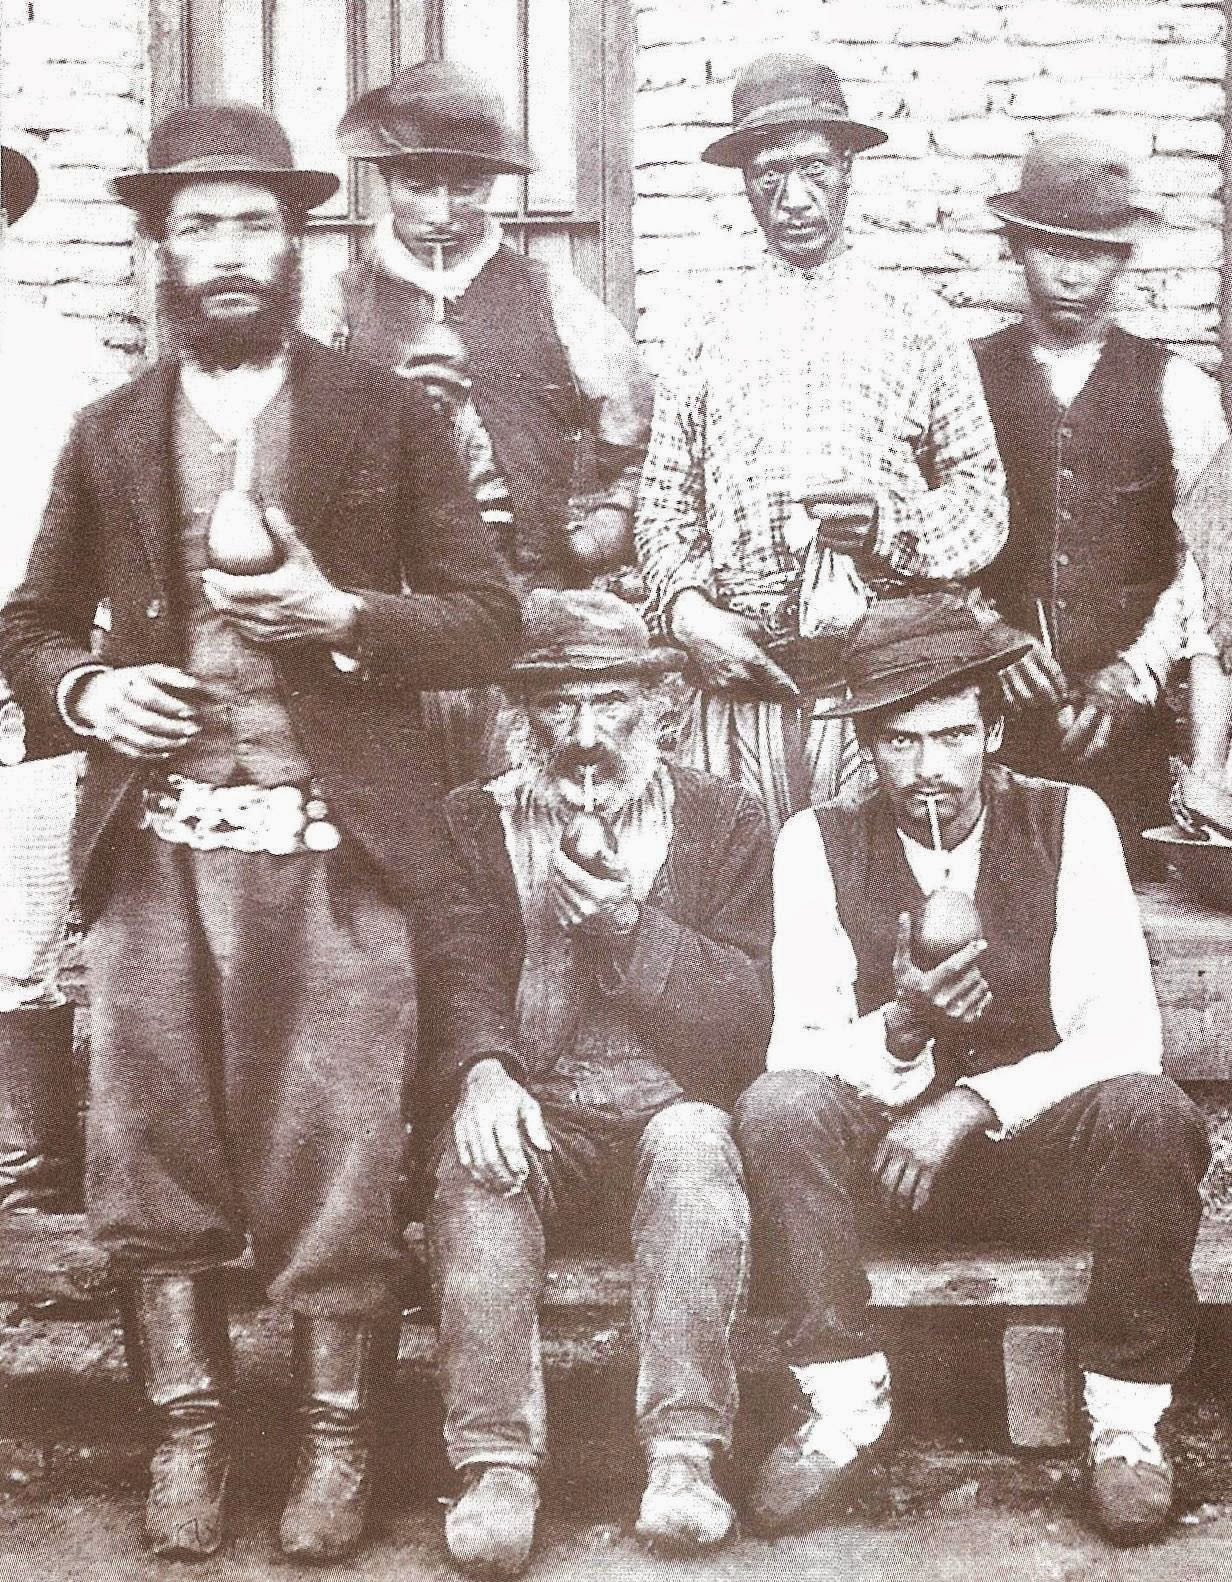 Black gauchos, Argentina, 1895